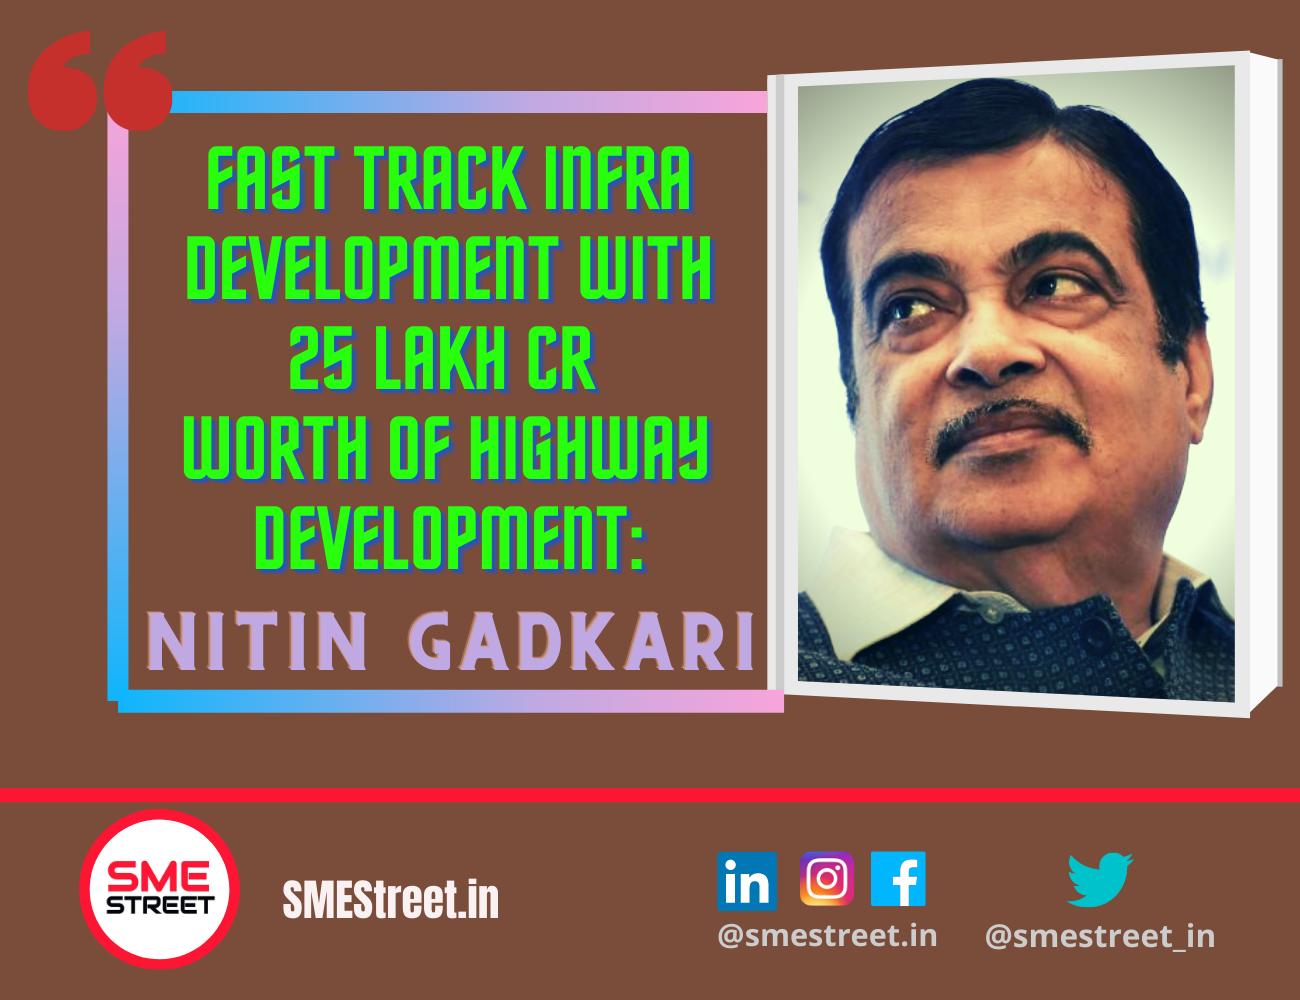 National Highways Construction Witnessed Rise During Covid Era: Nitin Gadkari